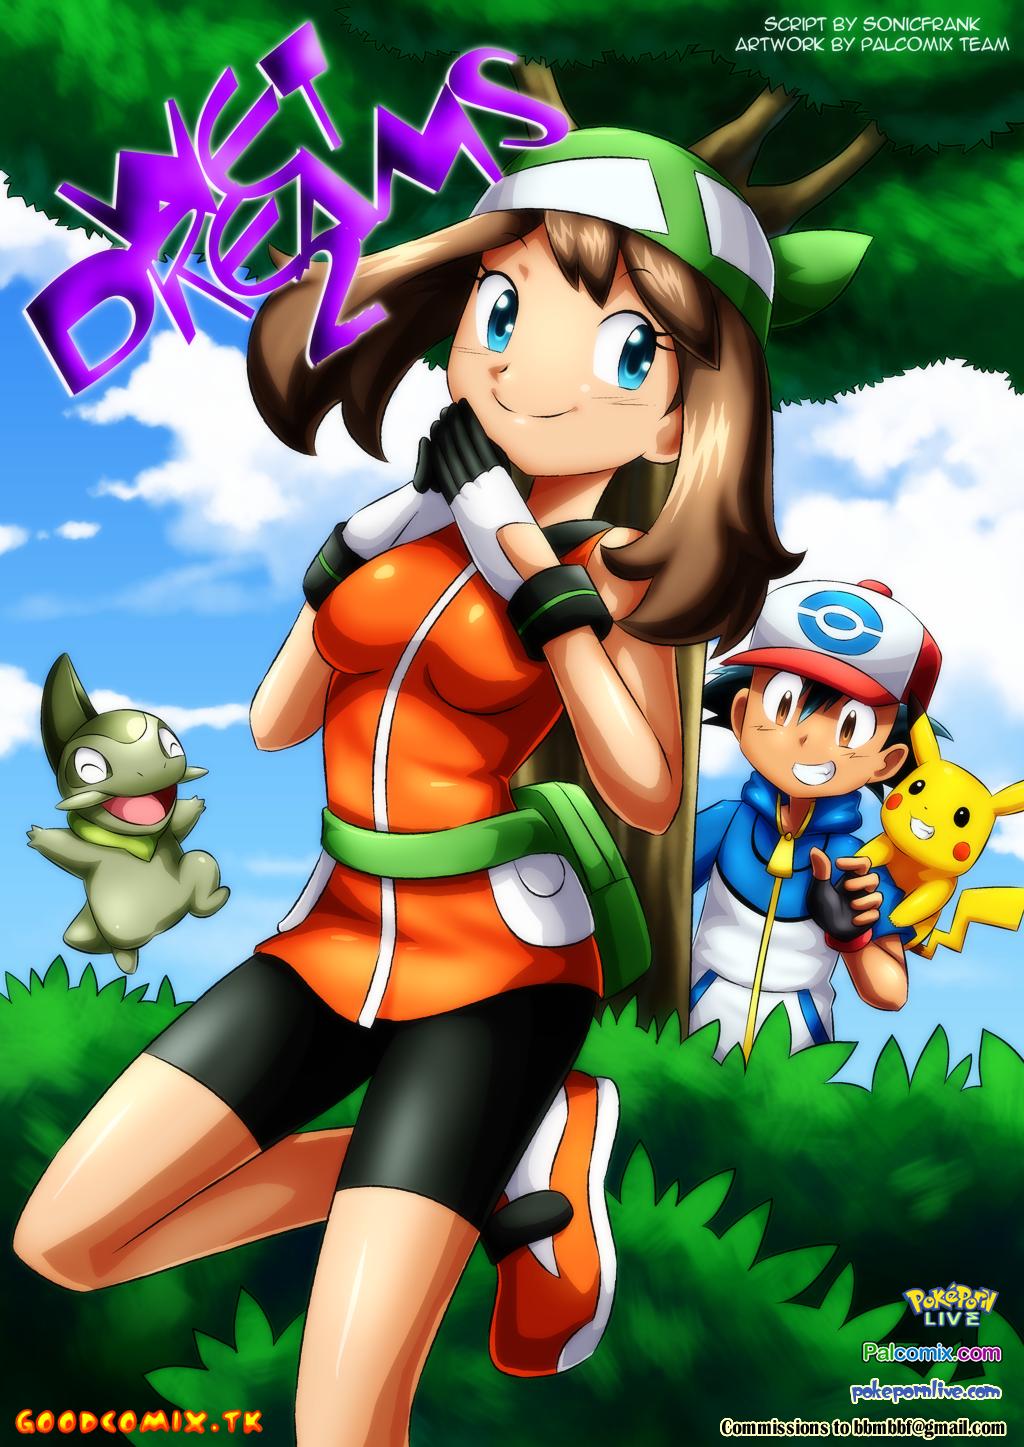 Goodcomix Pokemon - [Palcomix][PokepornLive] - Wet Dreams 2